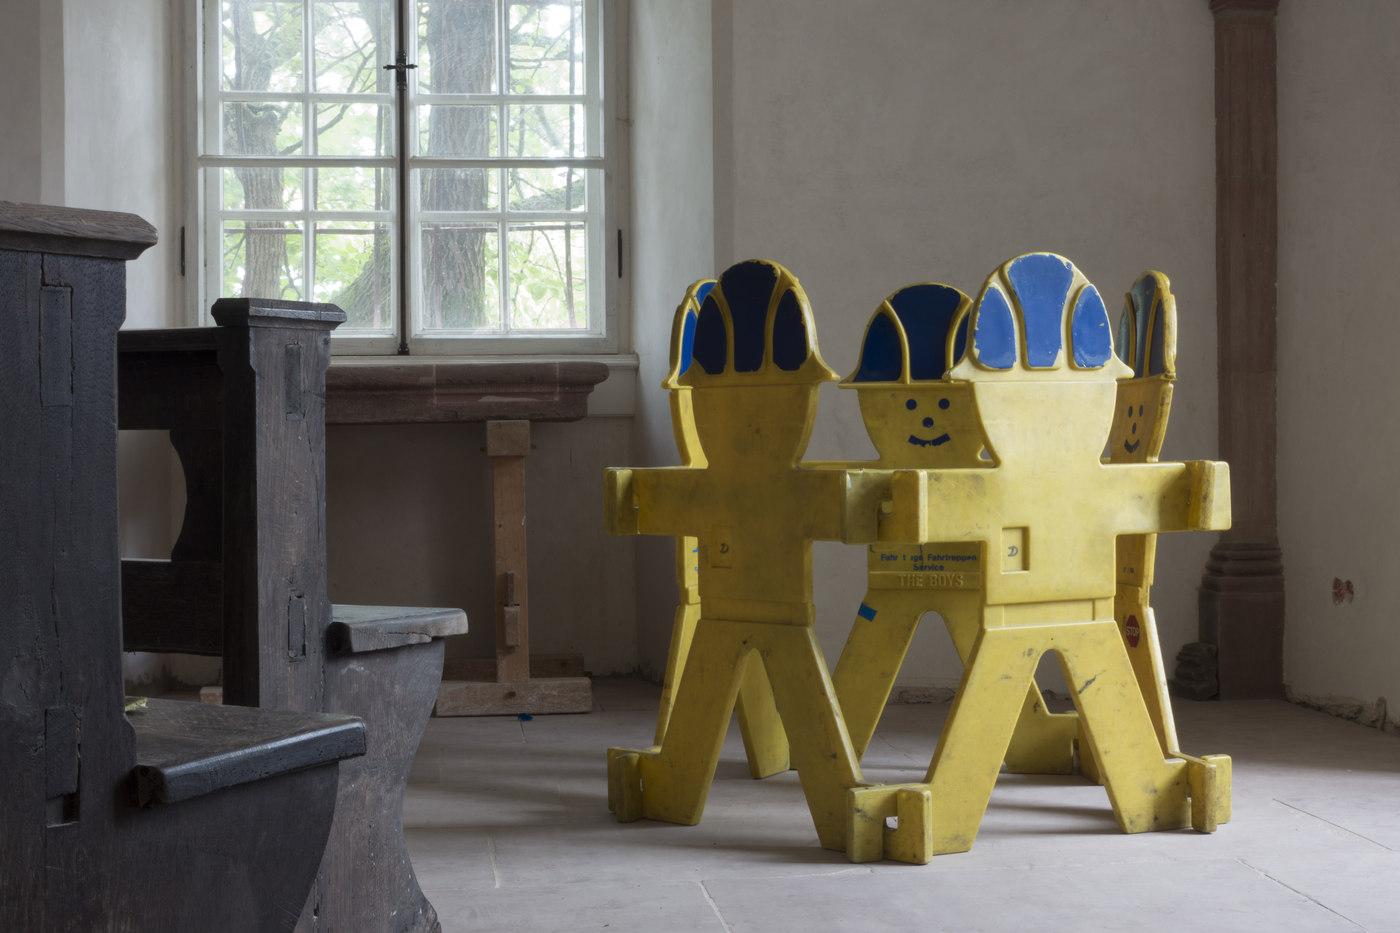 Kunstverein Wiesen_KuWi_Forward to History_Jan Kiefer & Robert Brambora_2016_RB_Room1b